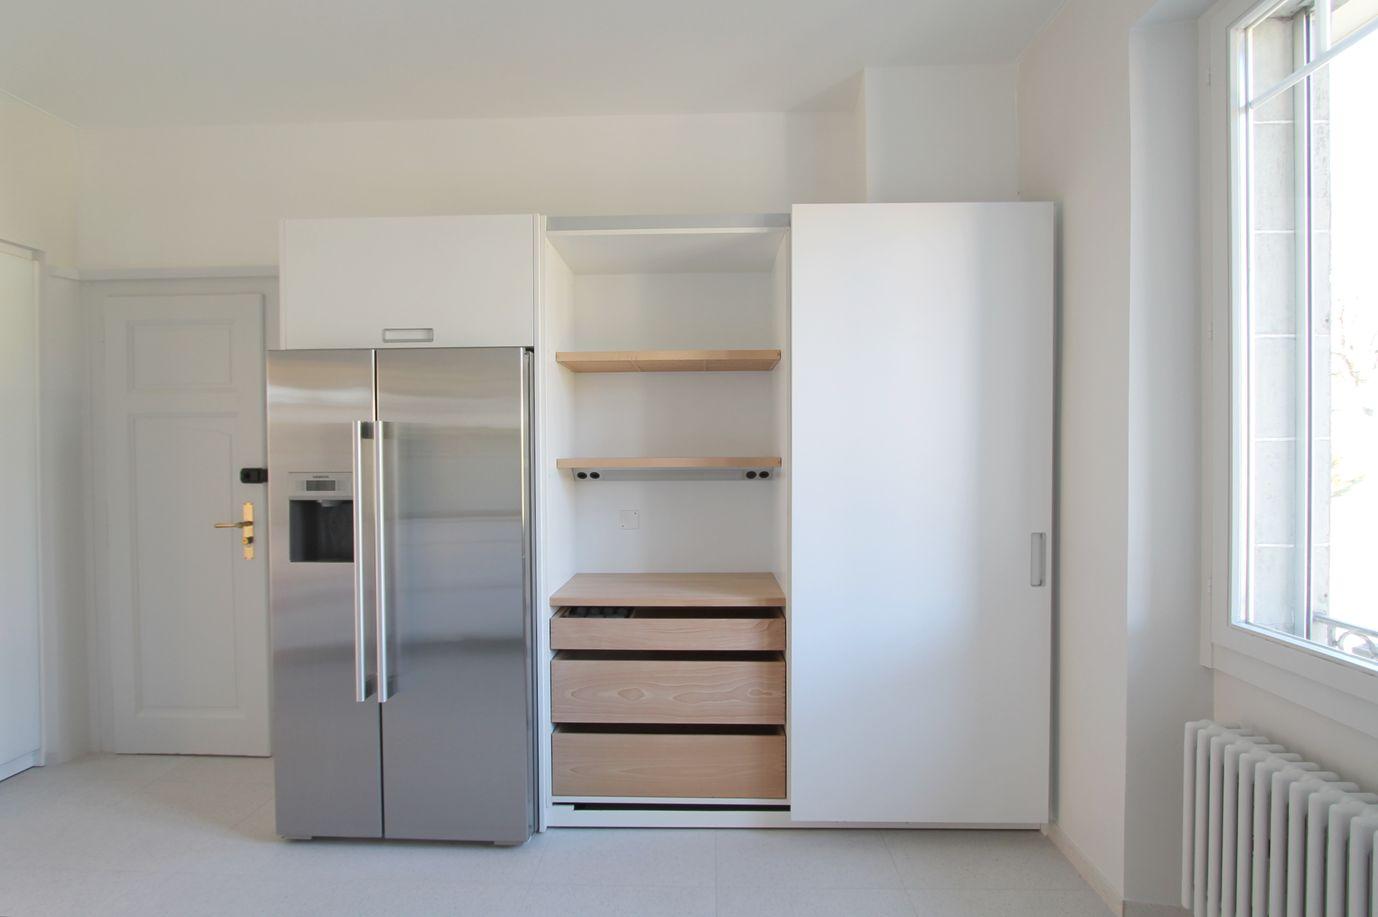 Cuisine blanche moderne soigneusement aménagée , frigo américain